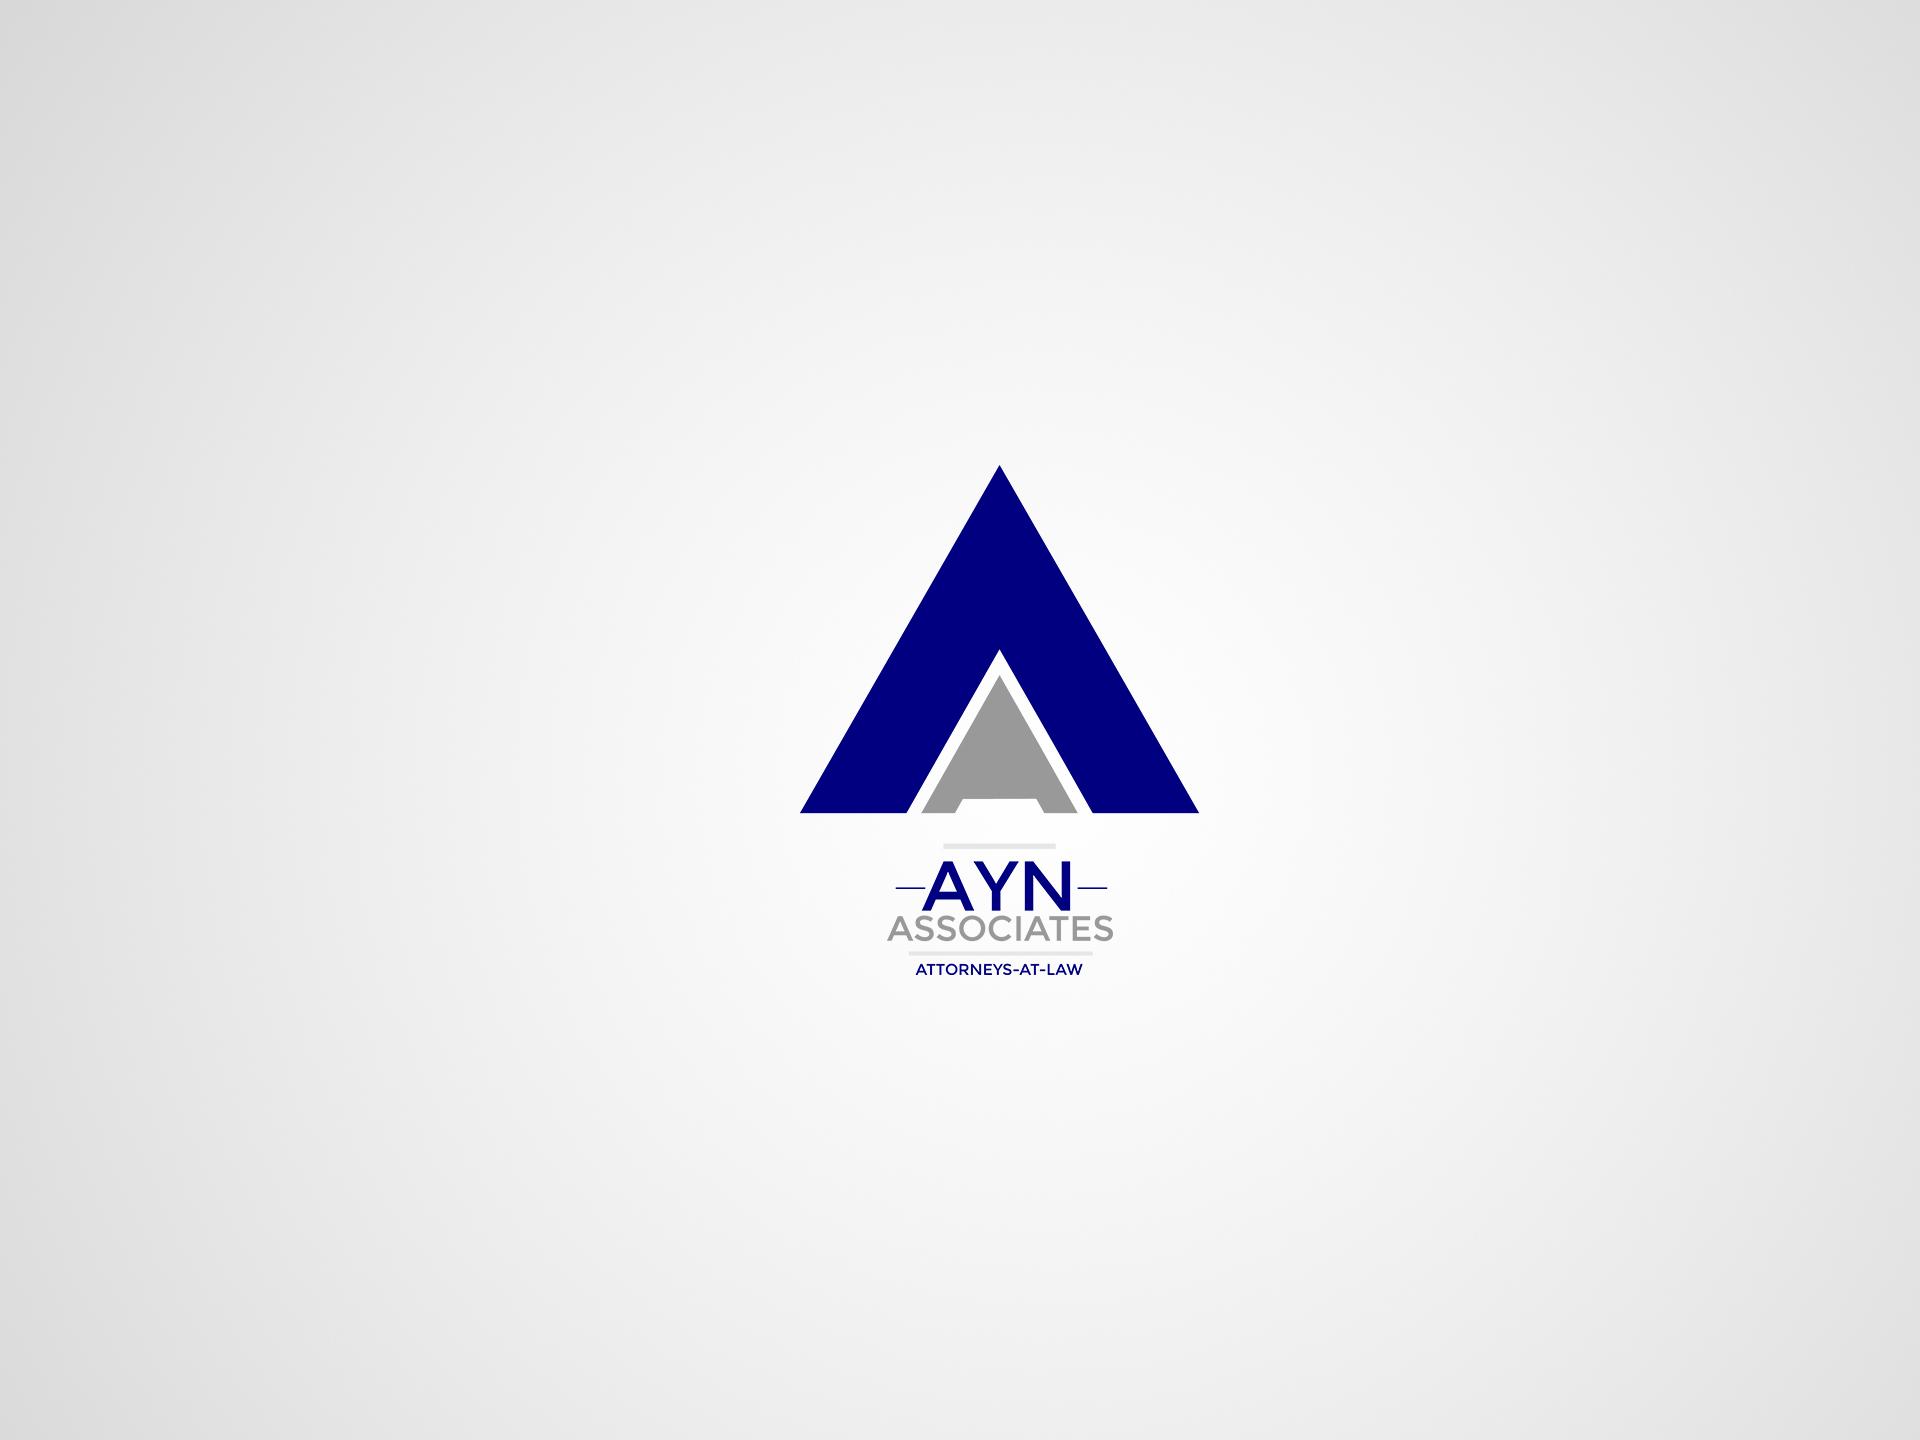 Ayn Associates logo